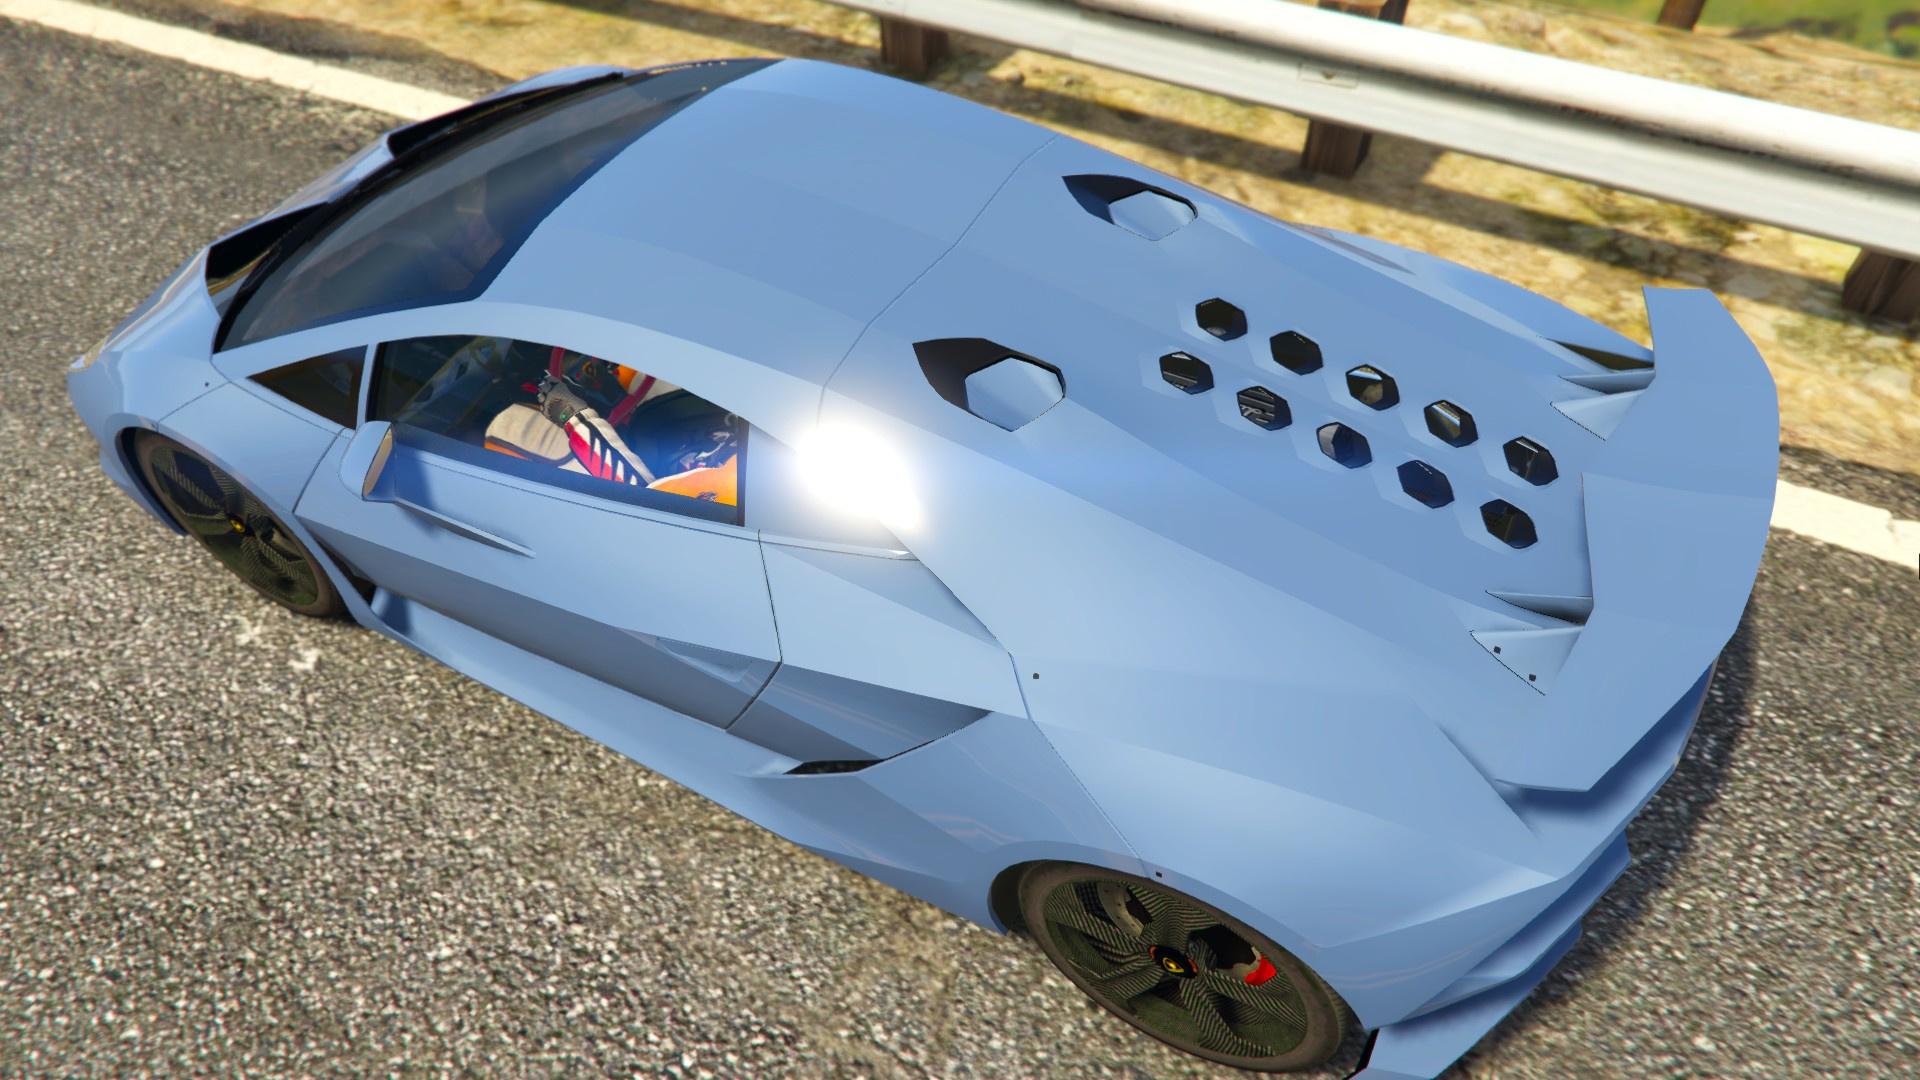 Lamborghini Sesto Elemento Tuning Gta5 Mods Com